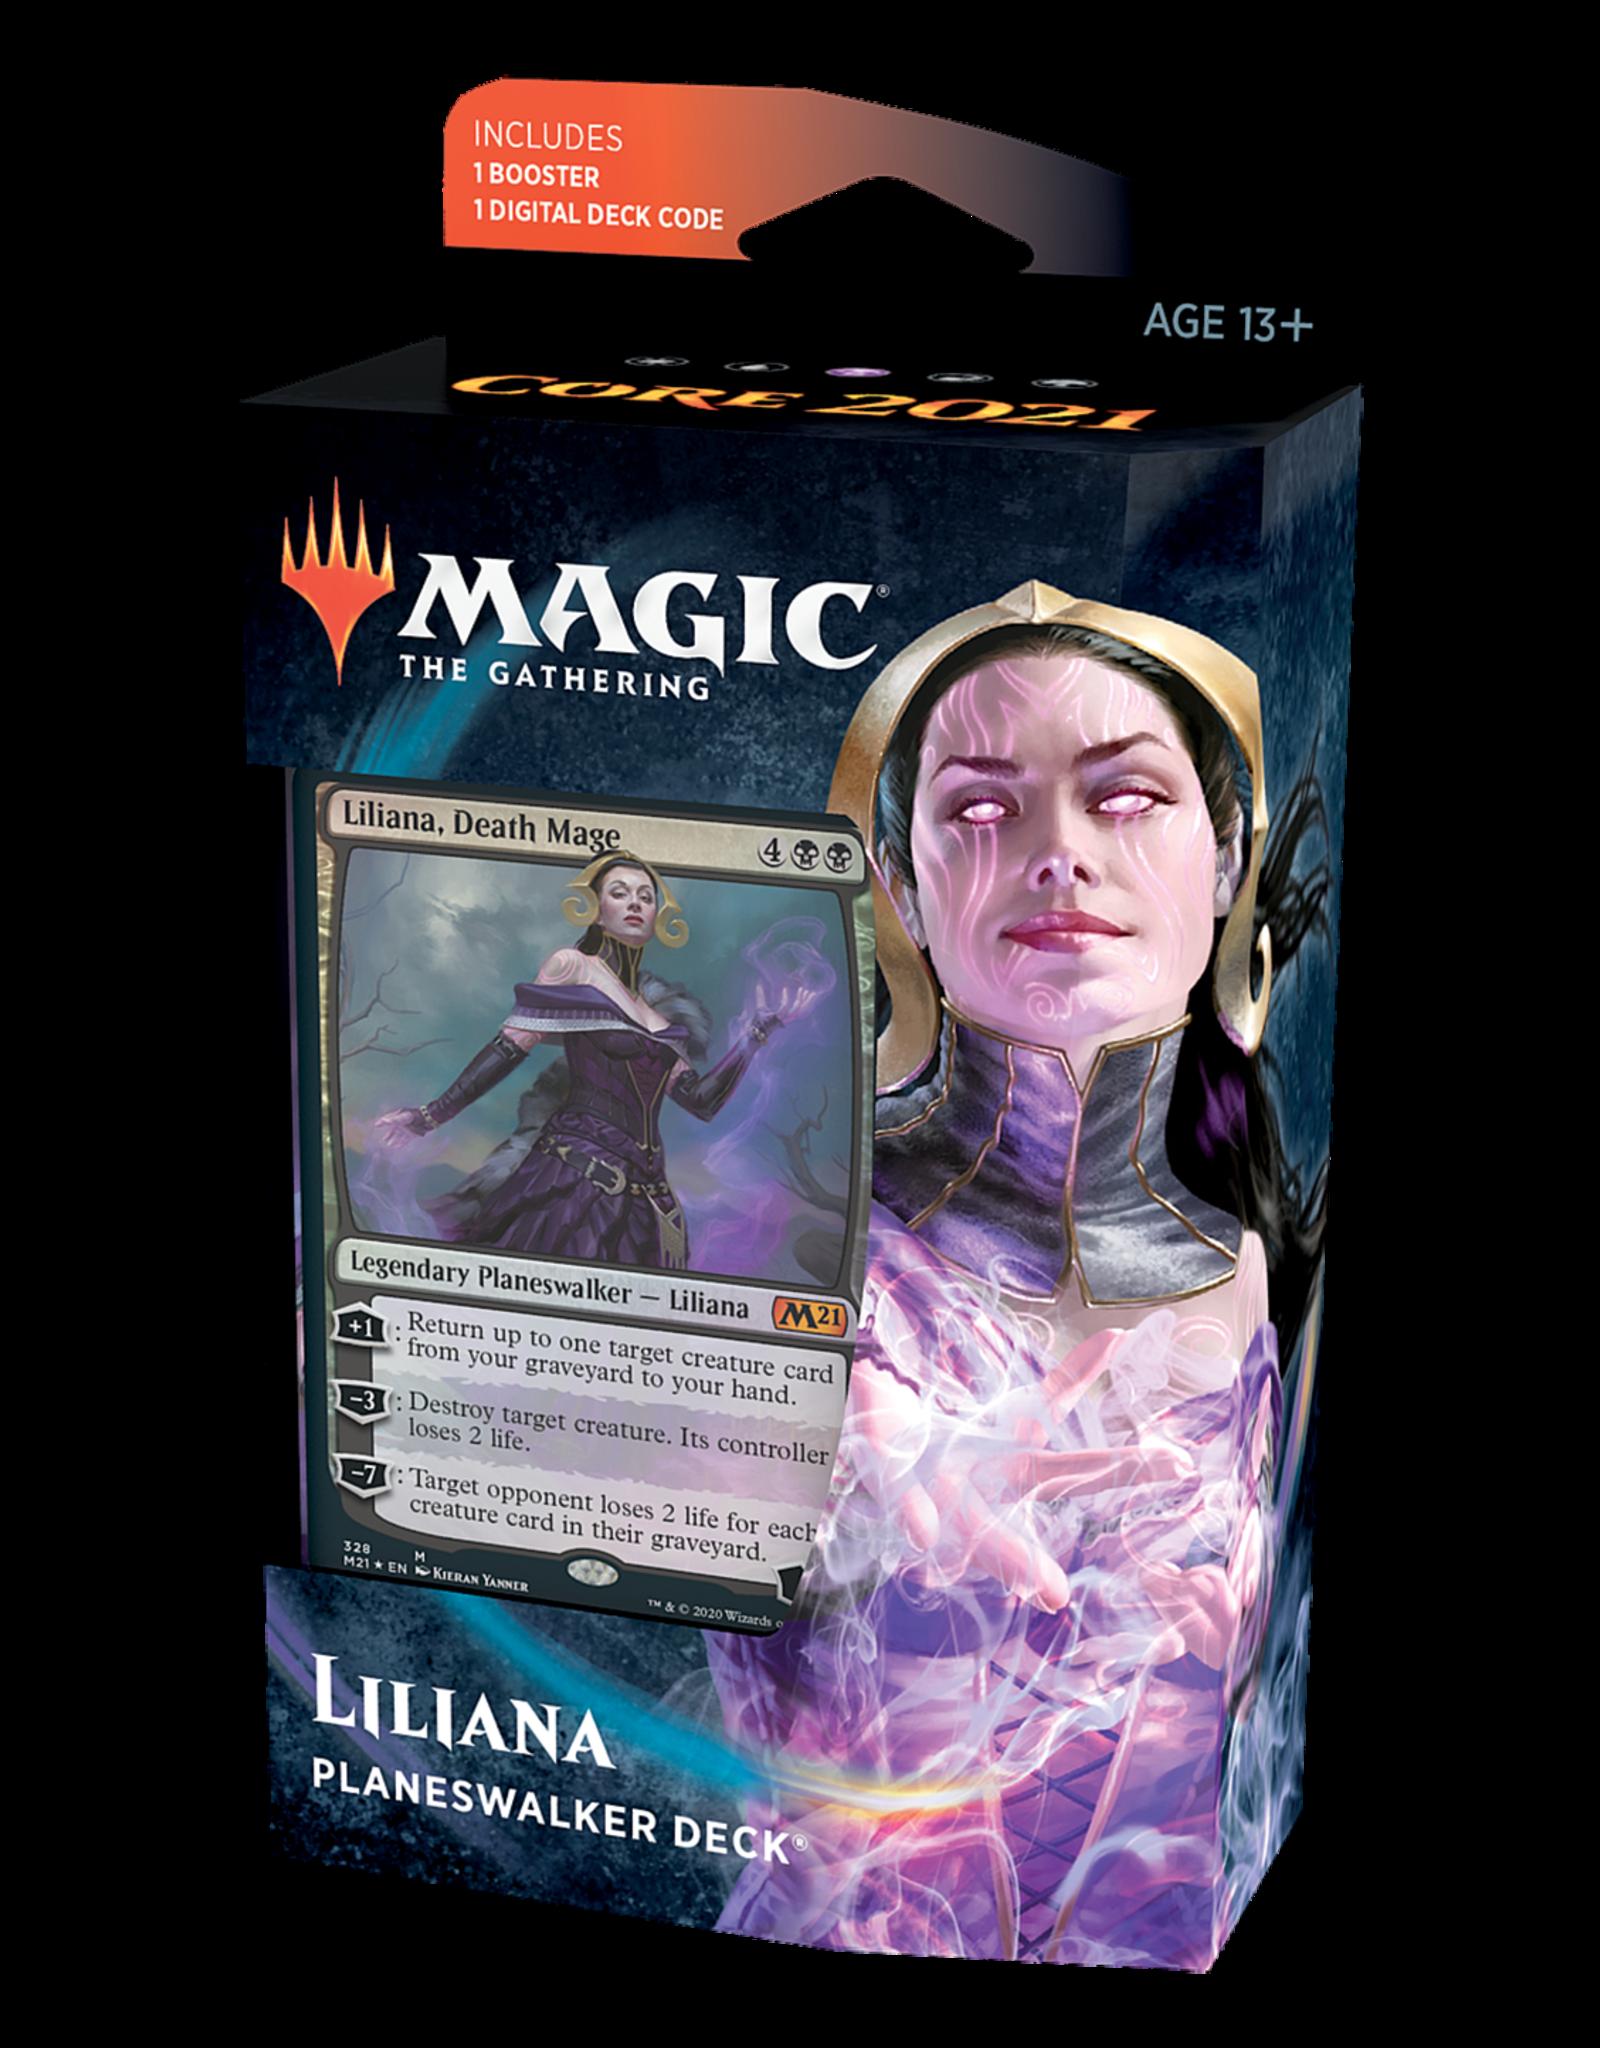 Magic: The Gathering Magic: The Gathering - Core Set 2021 - Planeswalker Deck - Liliana